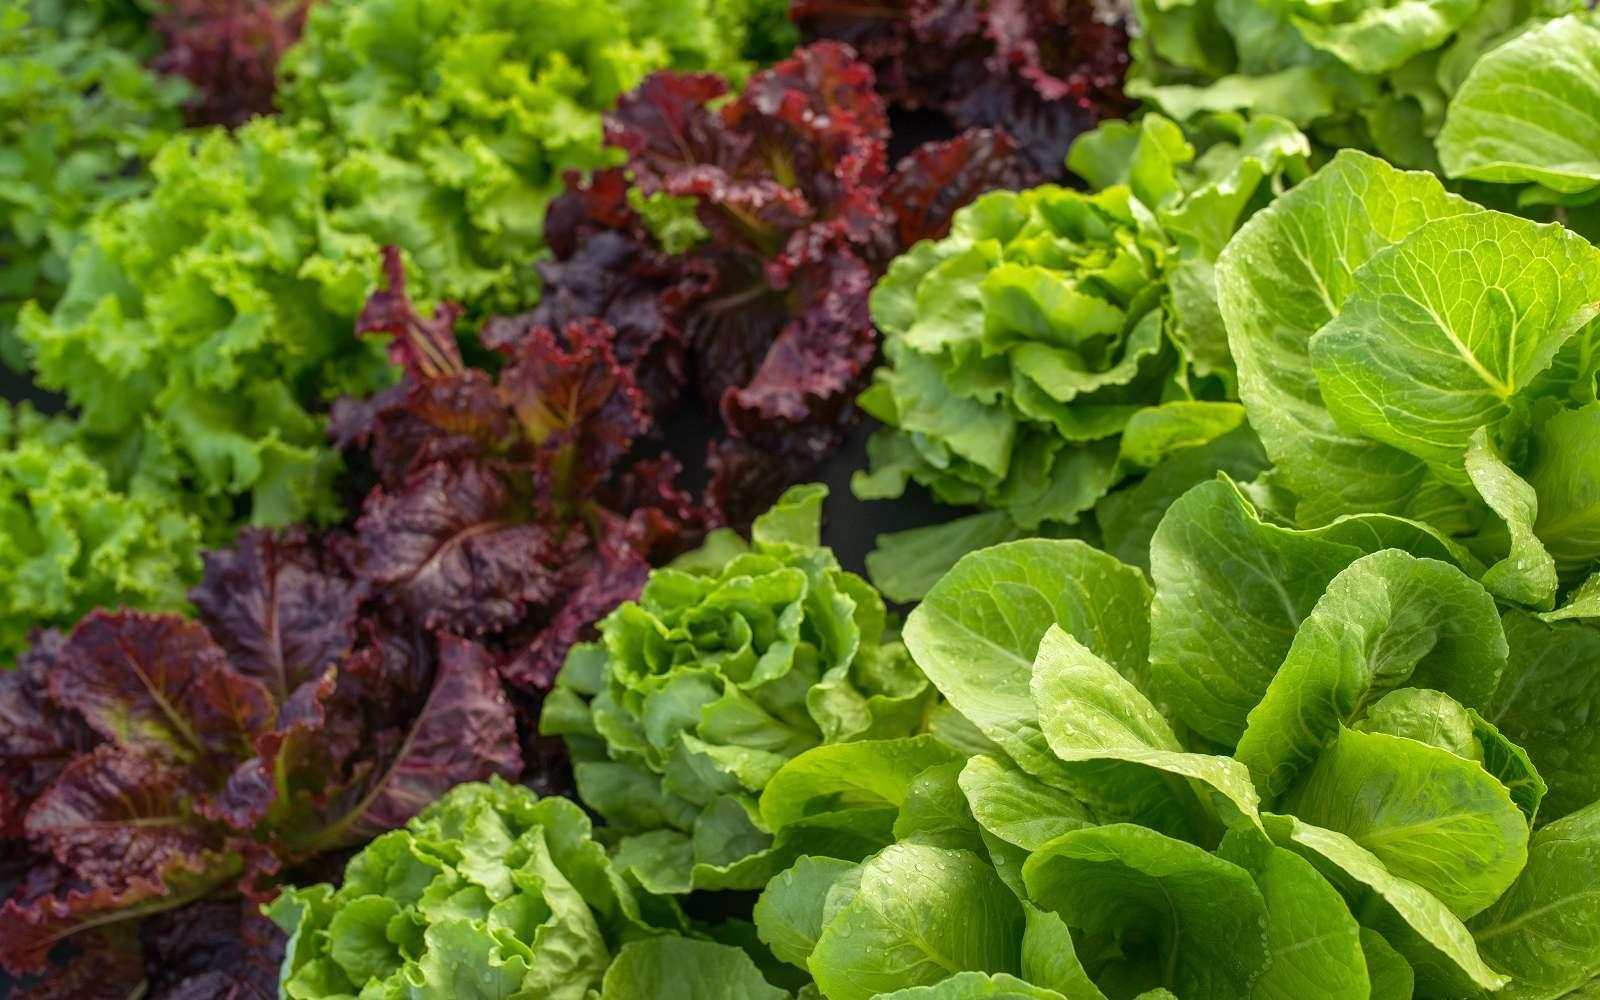 Profitez encore des salades tout l'hiver. © Iarygin Andrii, Adobe Stock